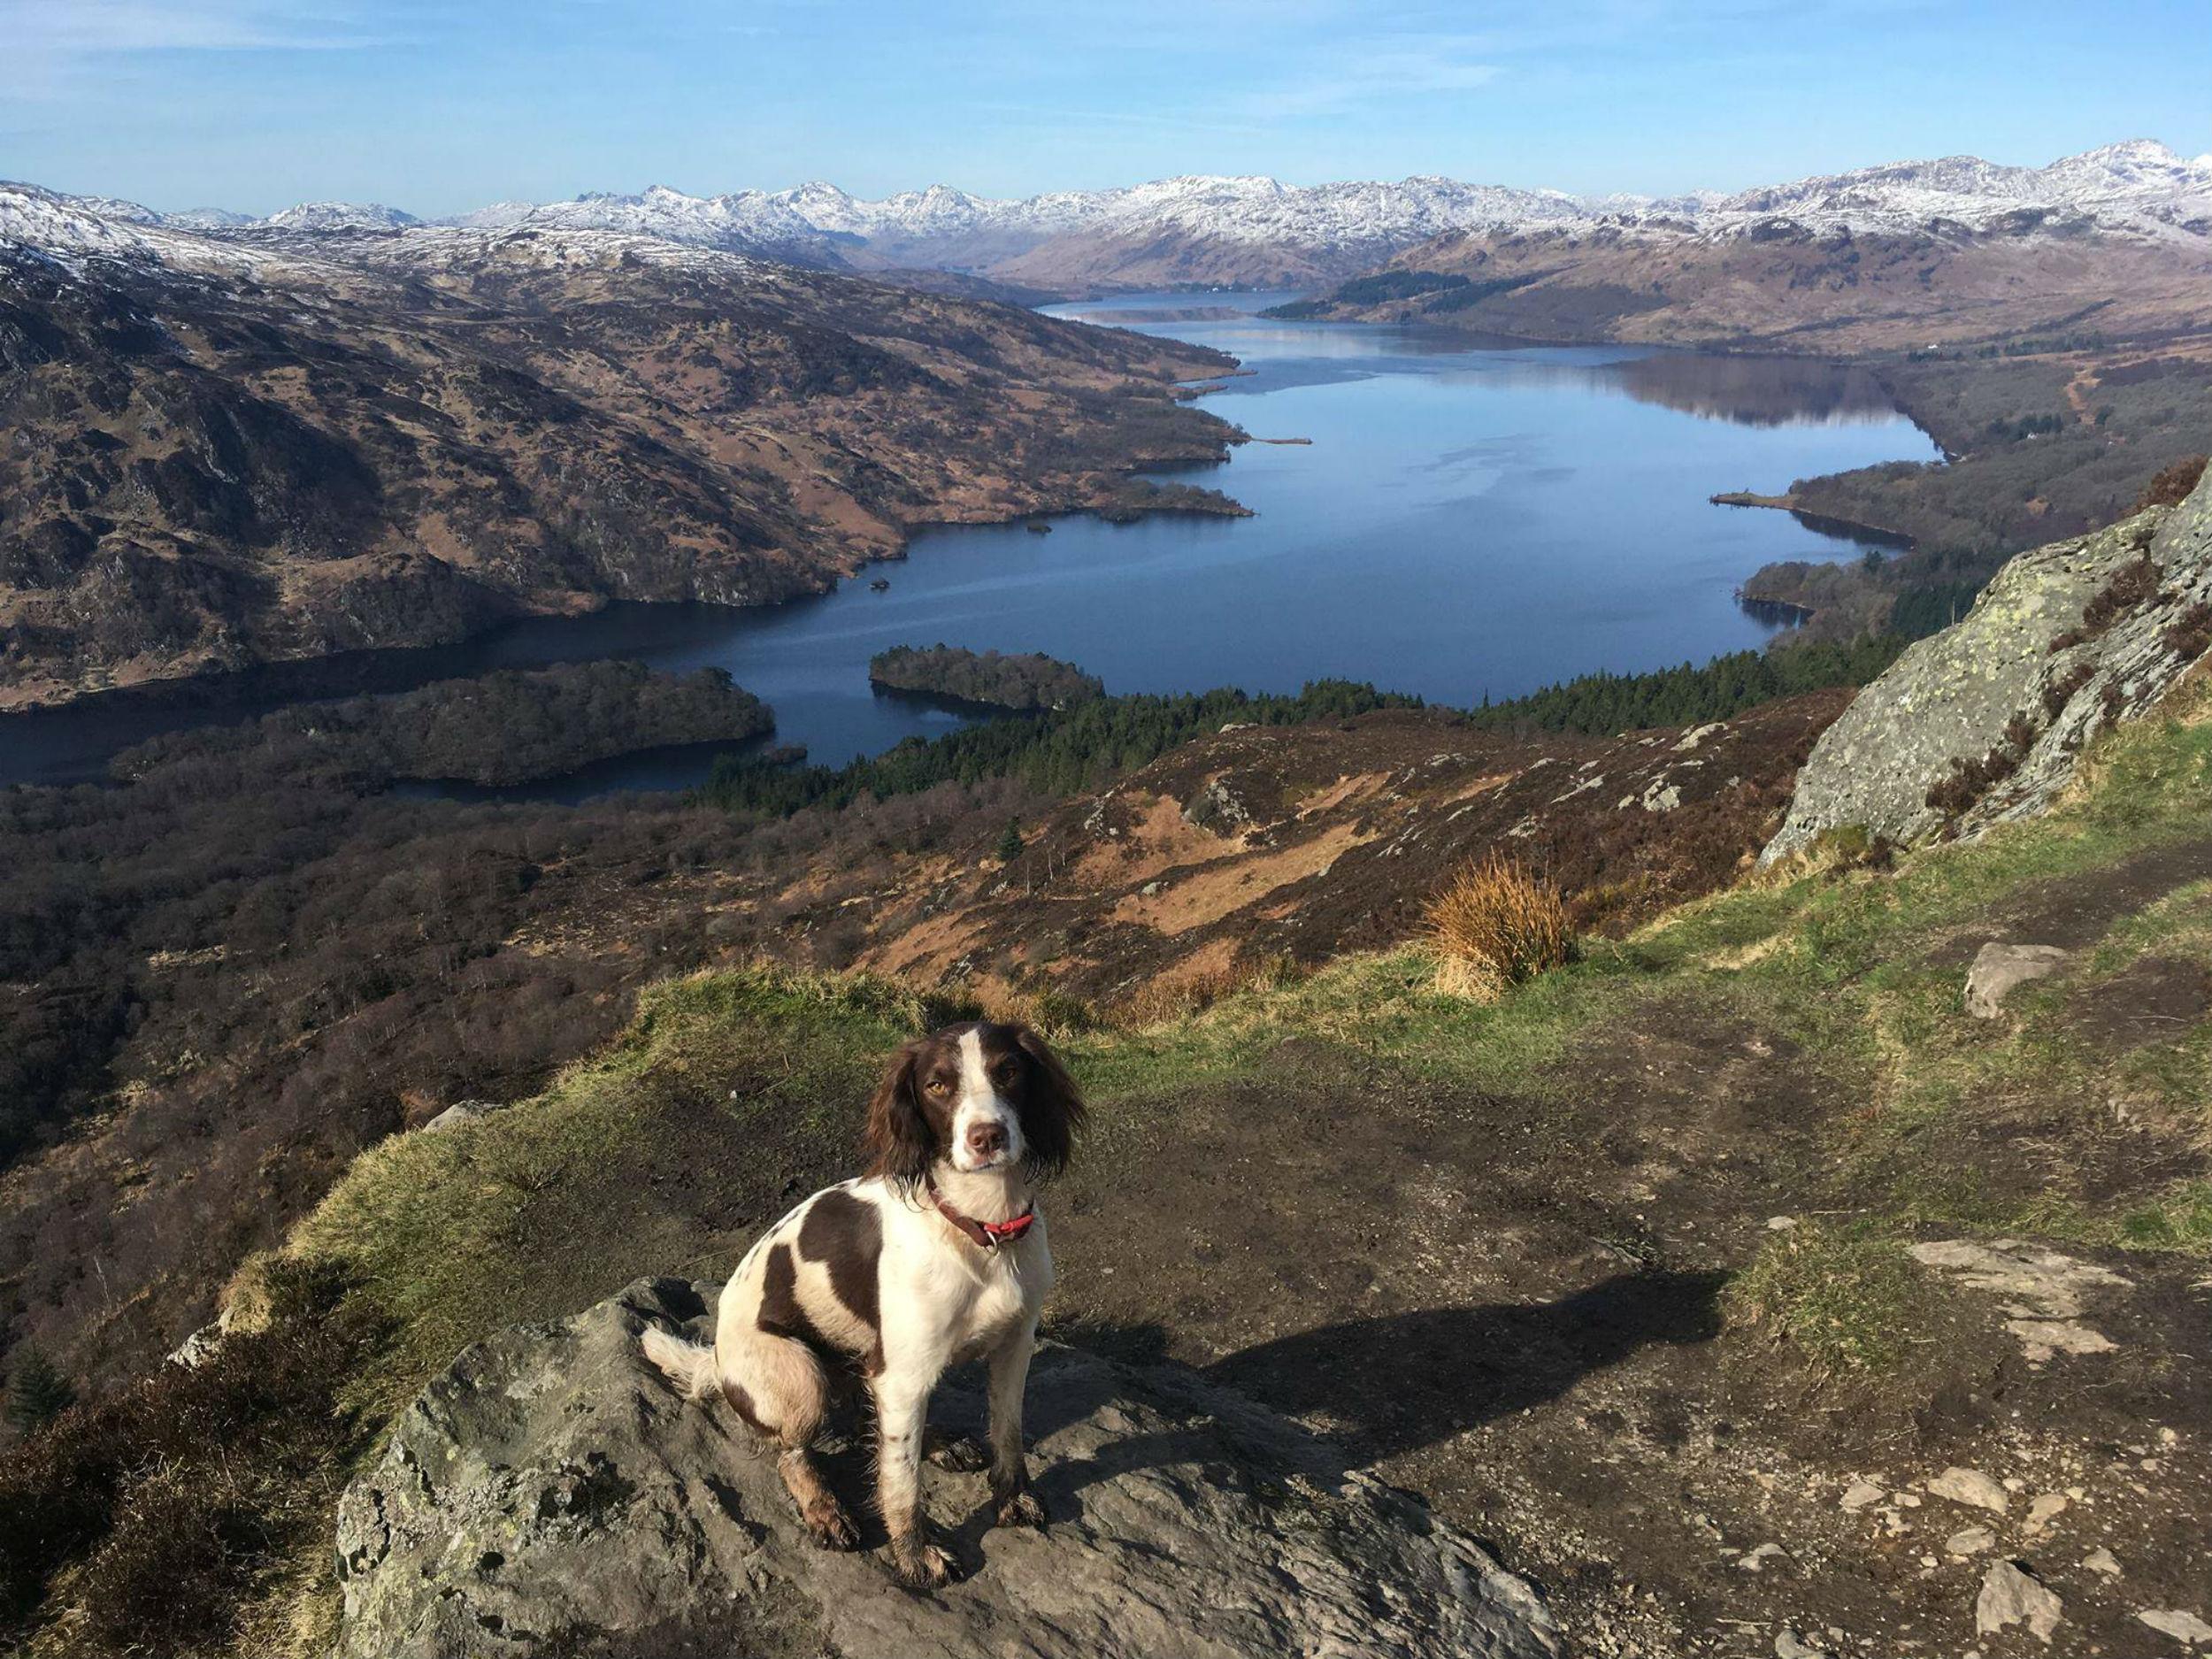 Kizzy the spaniel - Scottish News